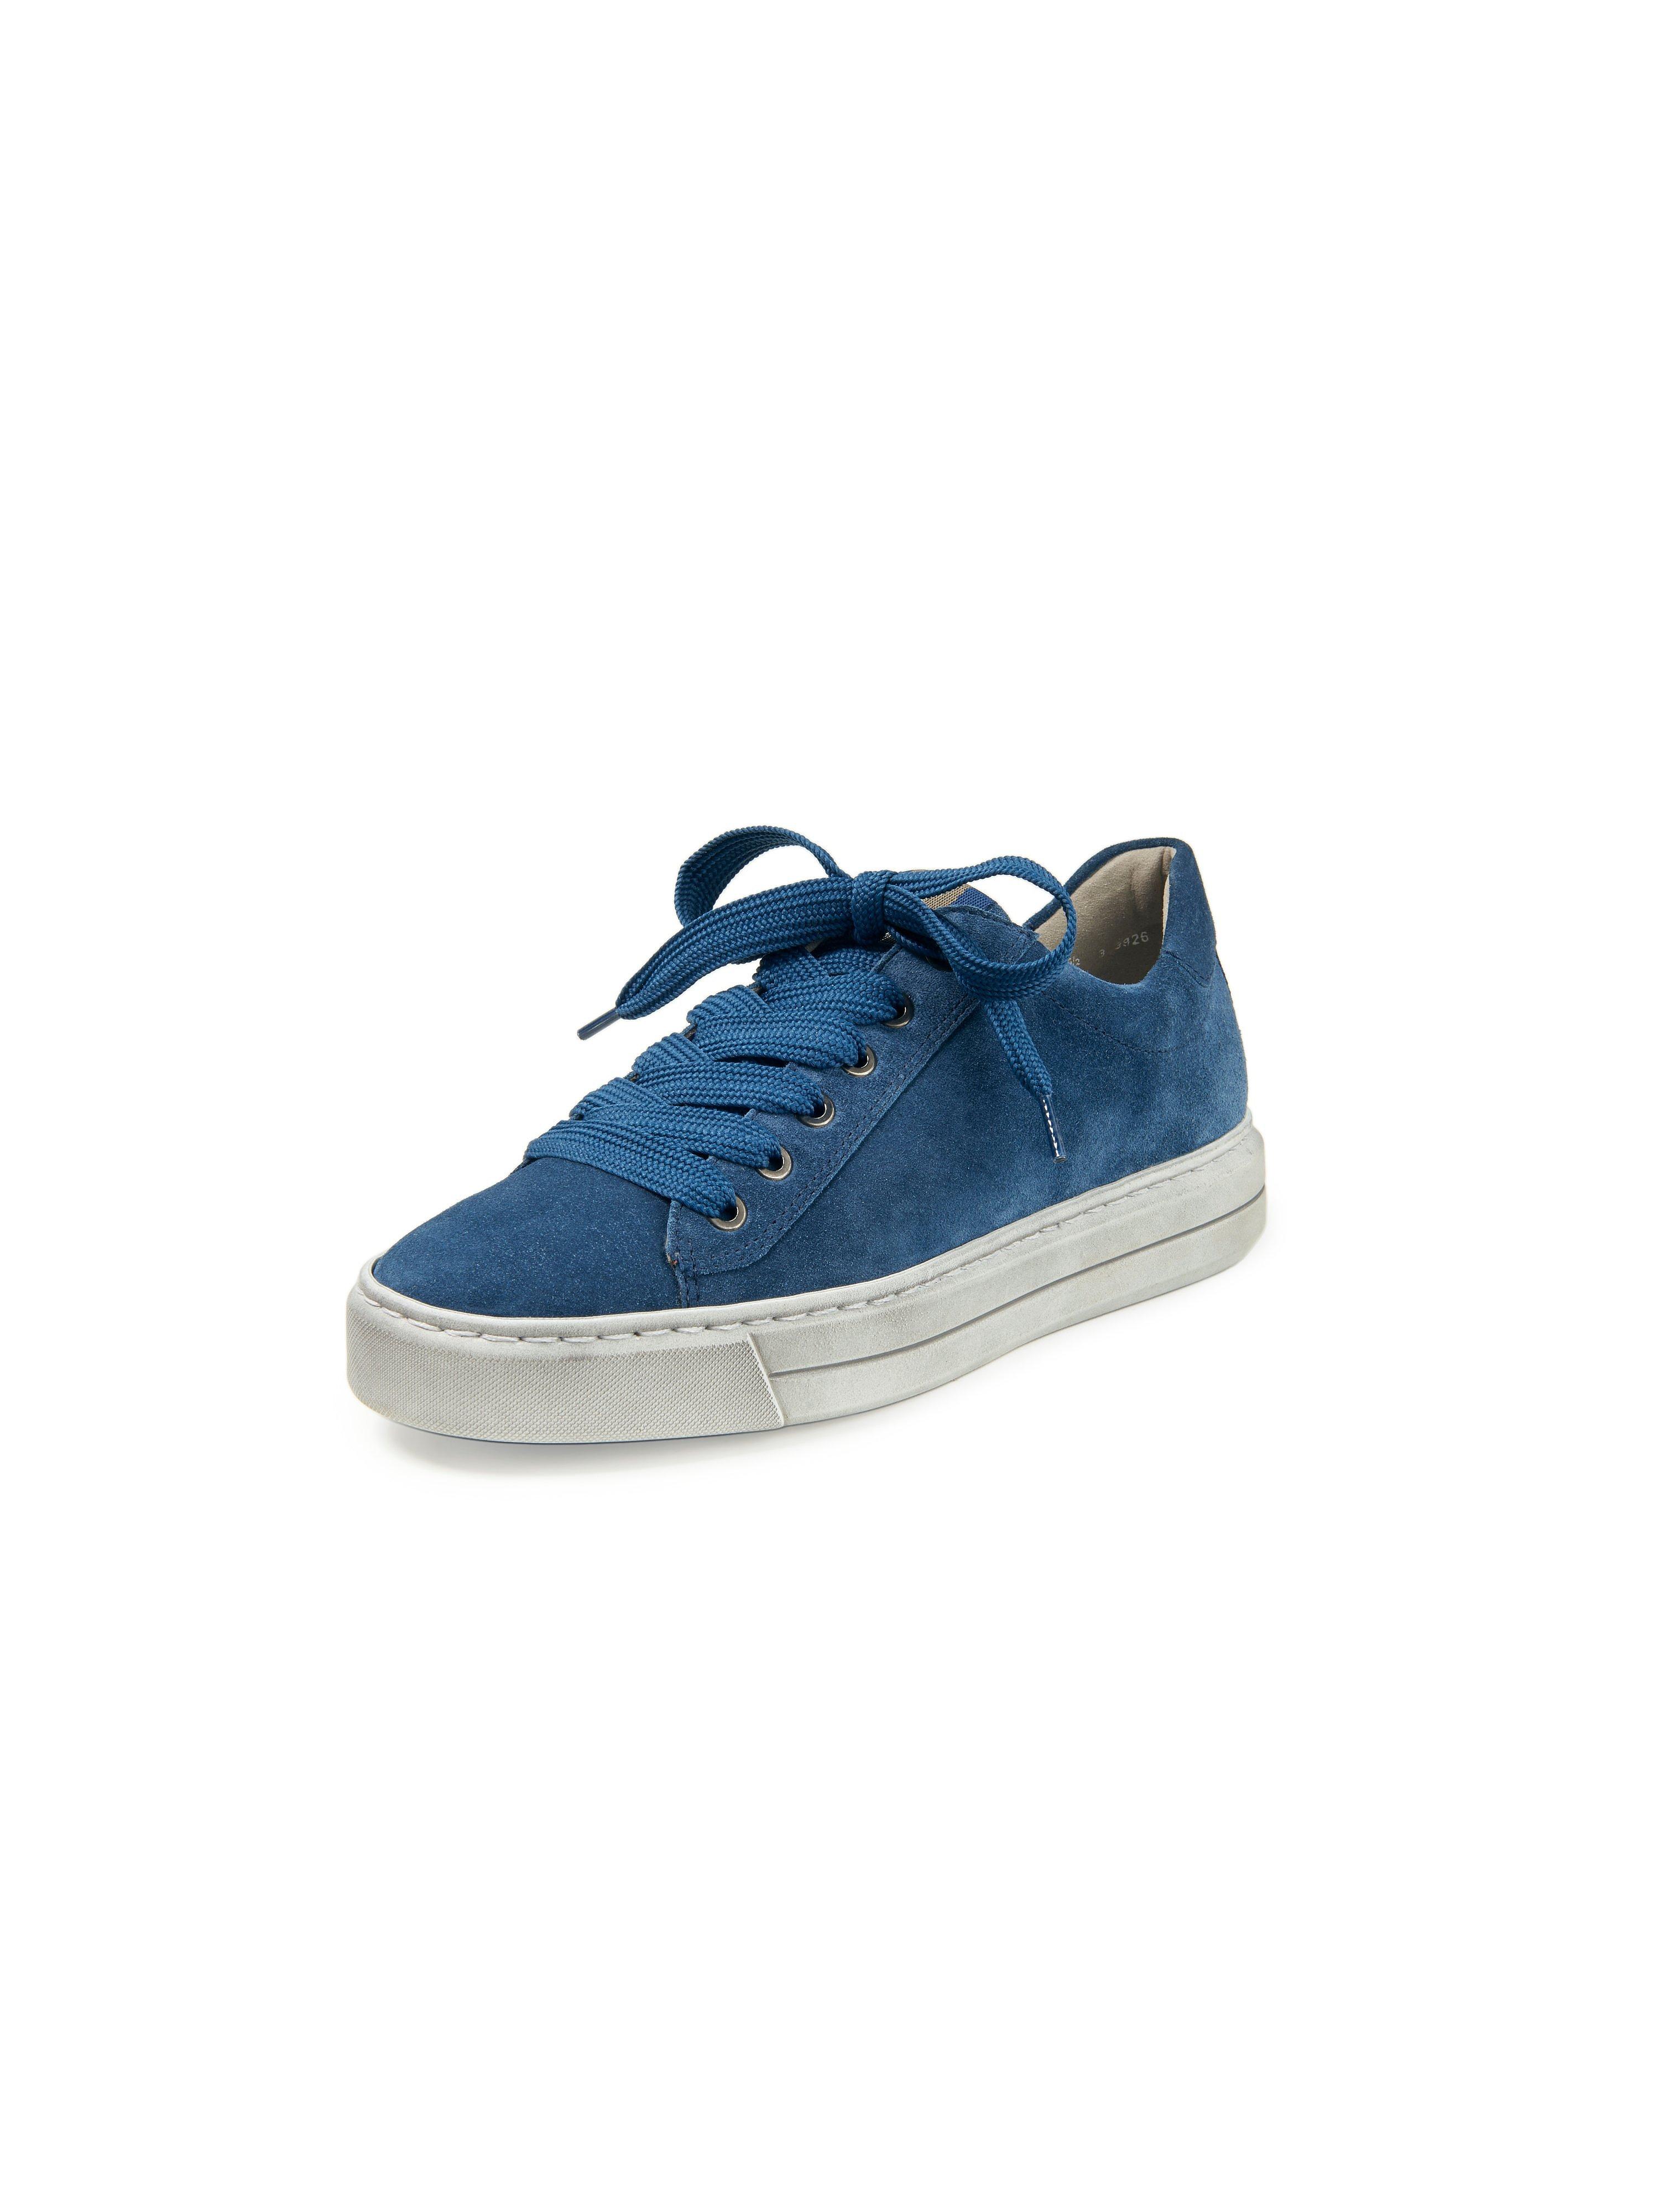 Sneakers Courtyard High Soft kalfsleer Van ARA blauw